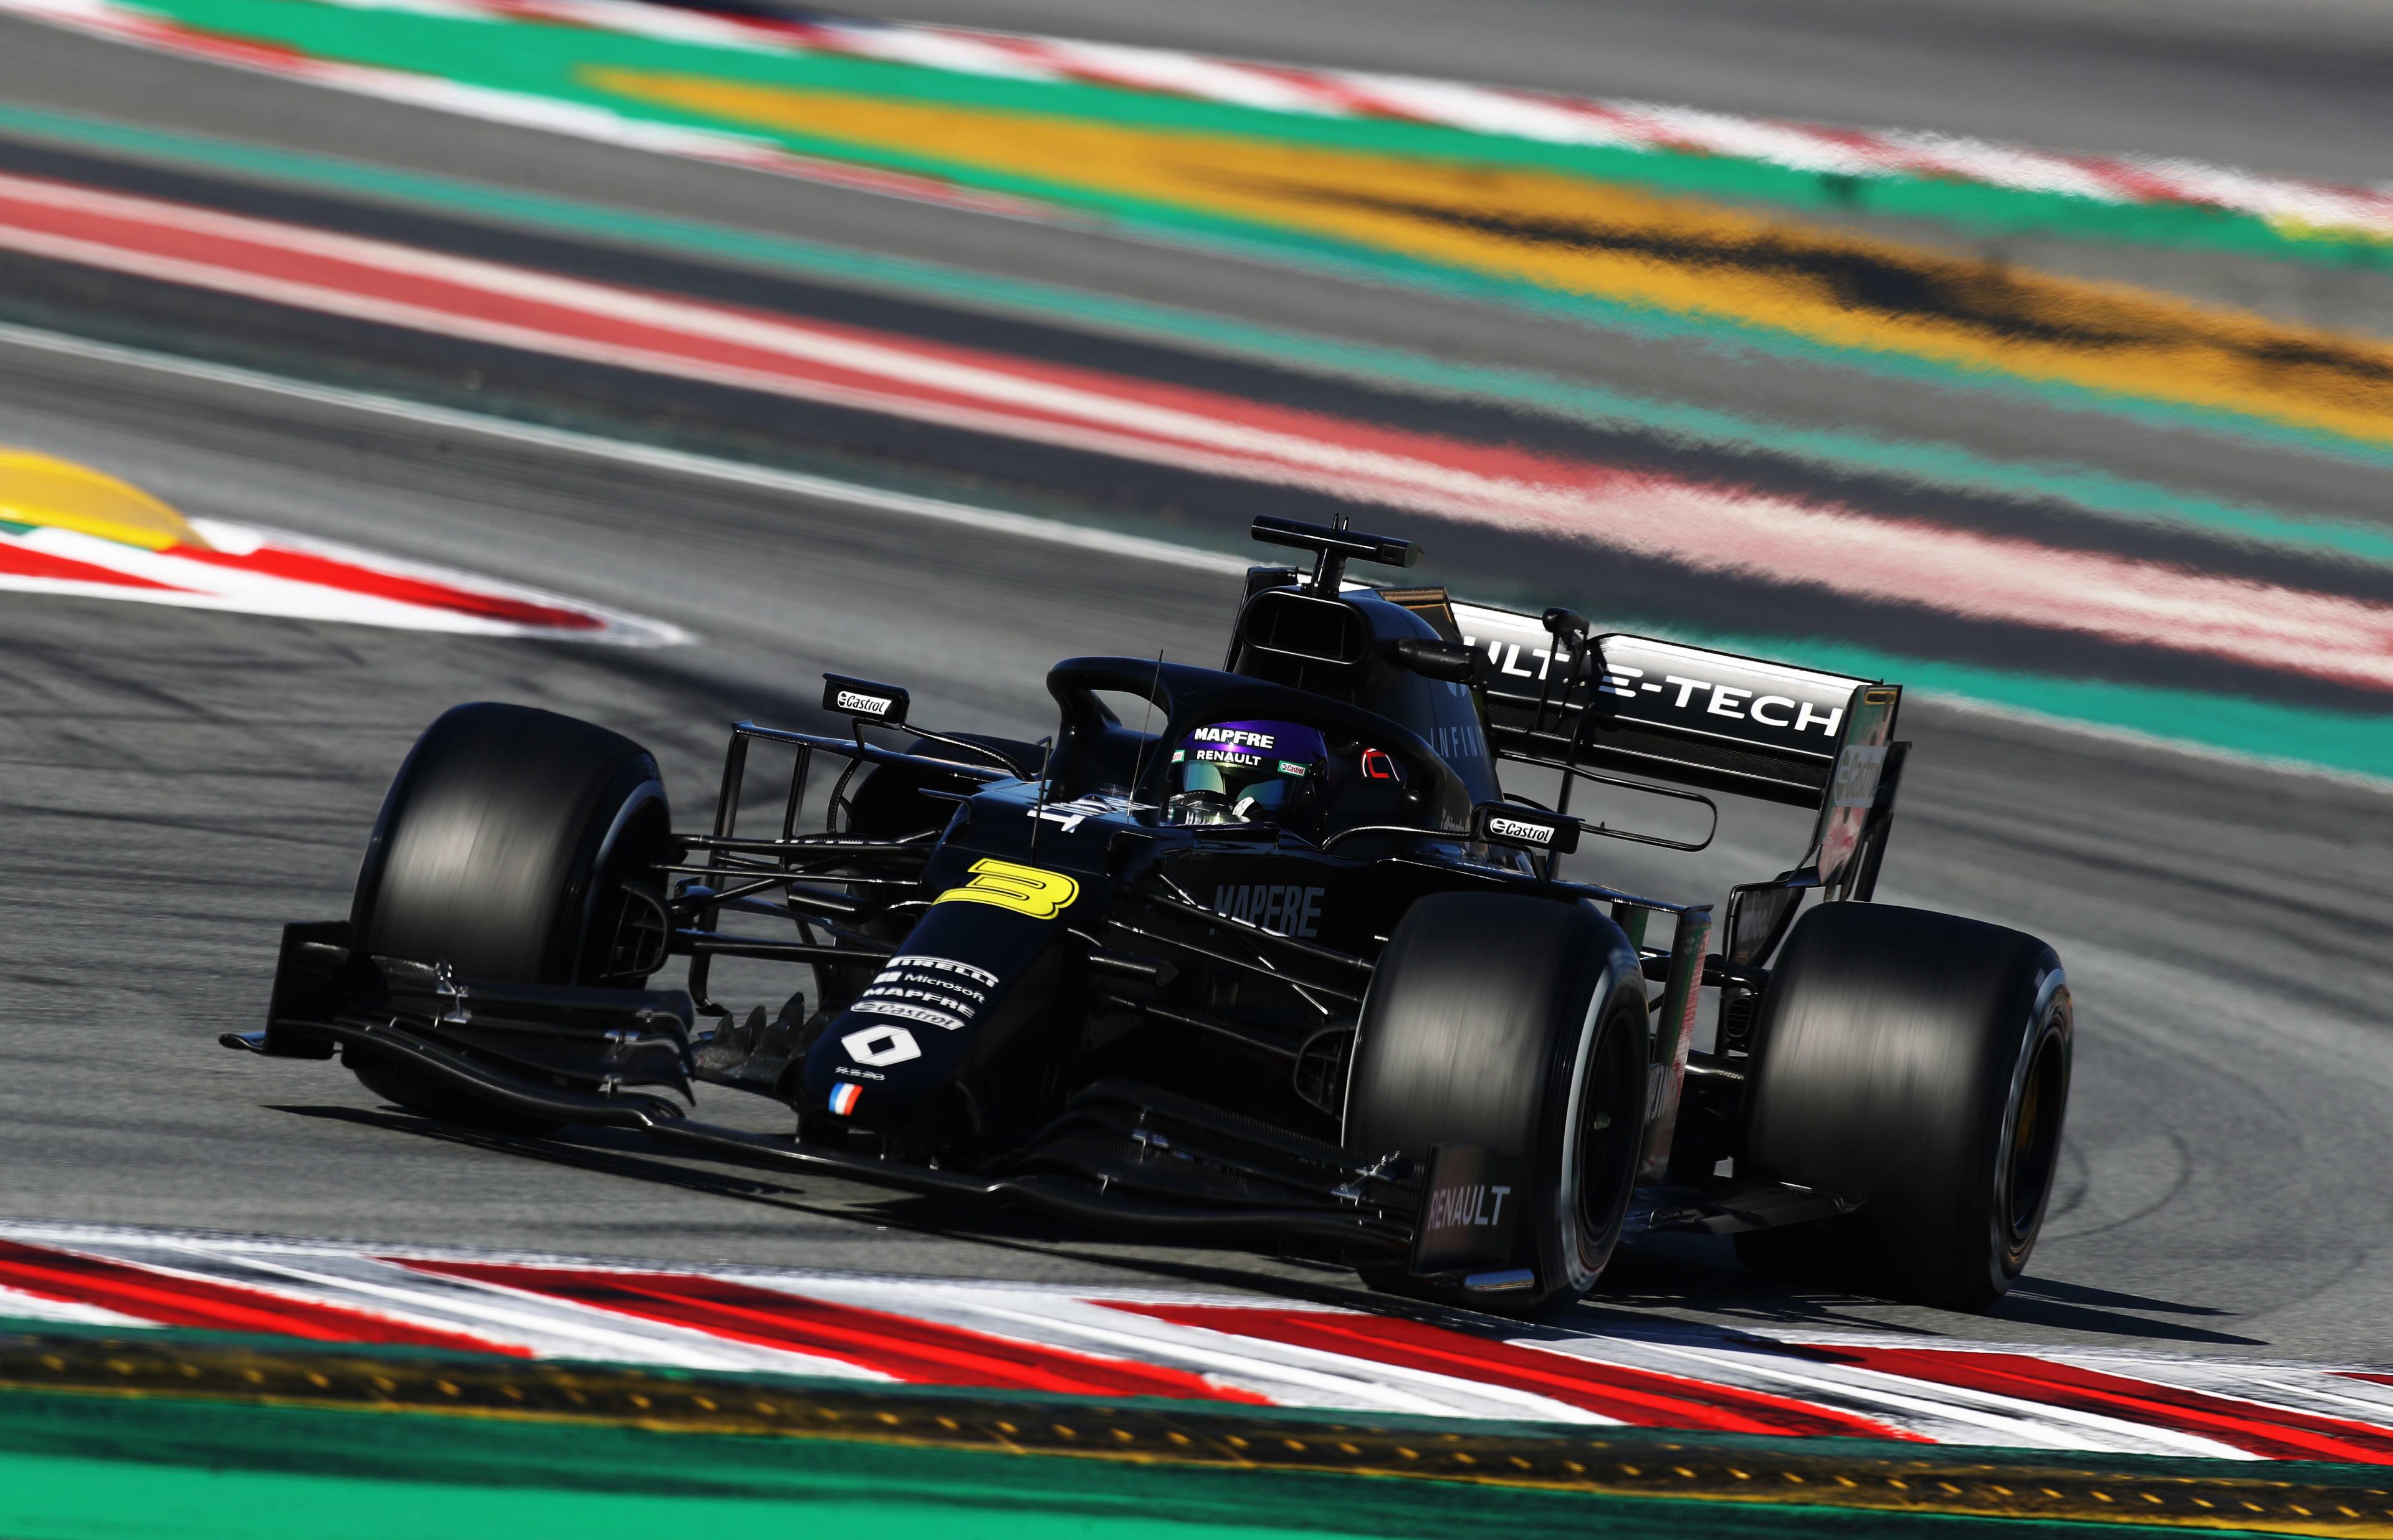 Morning testing report: Ricciardo fastest over Leclerc and Hamilton as just over 0.1s splits top 3 thumbnail